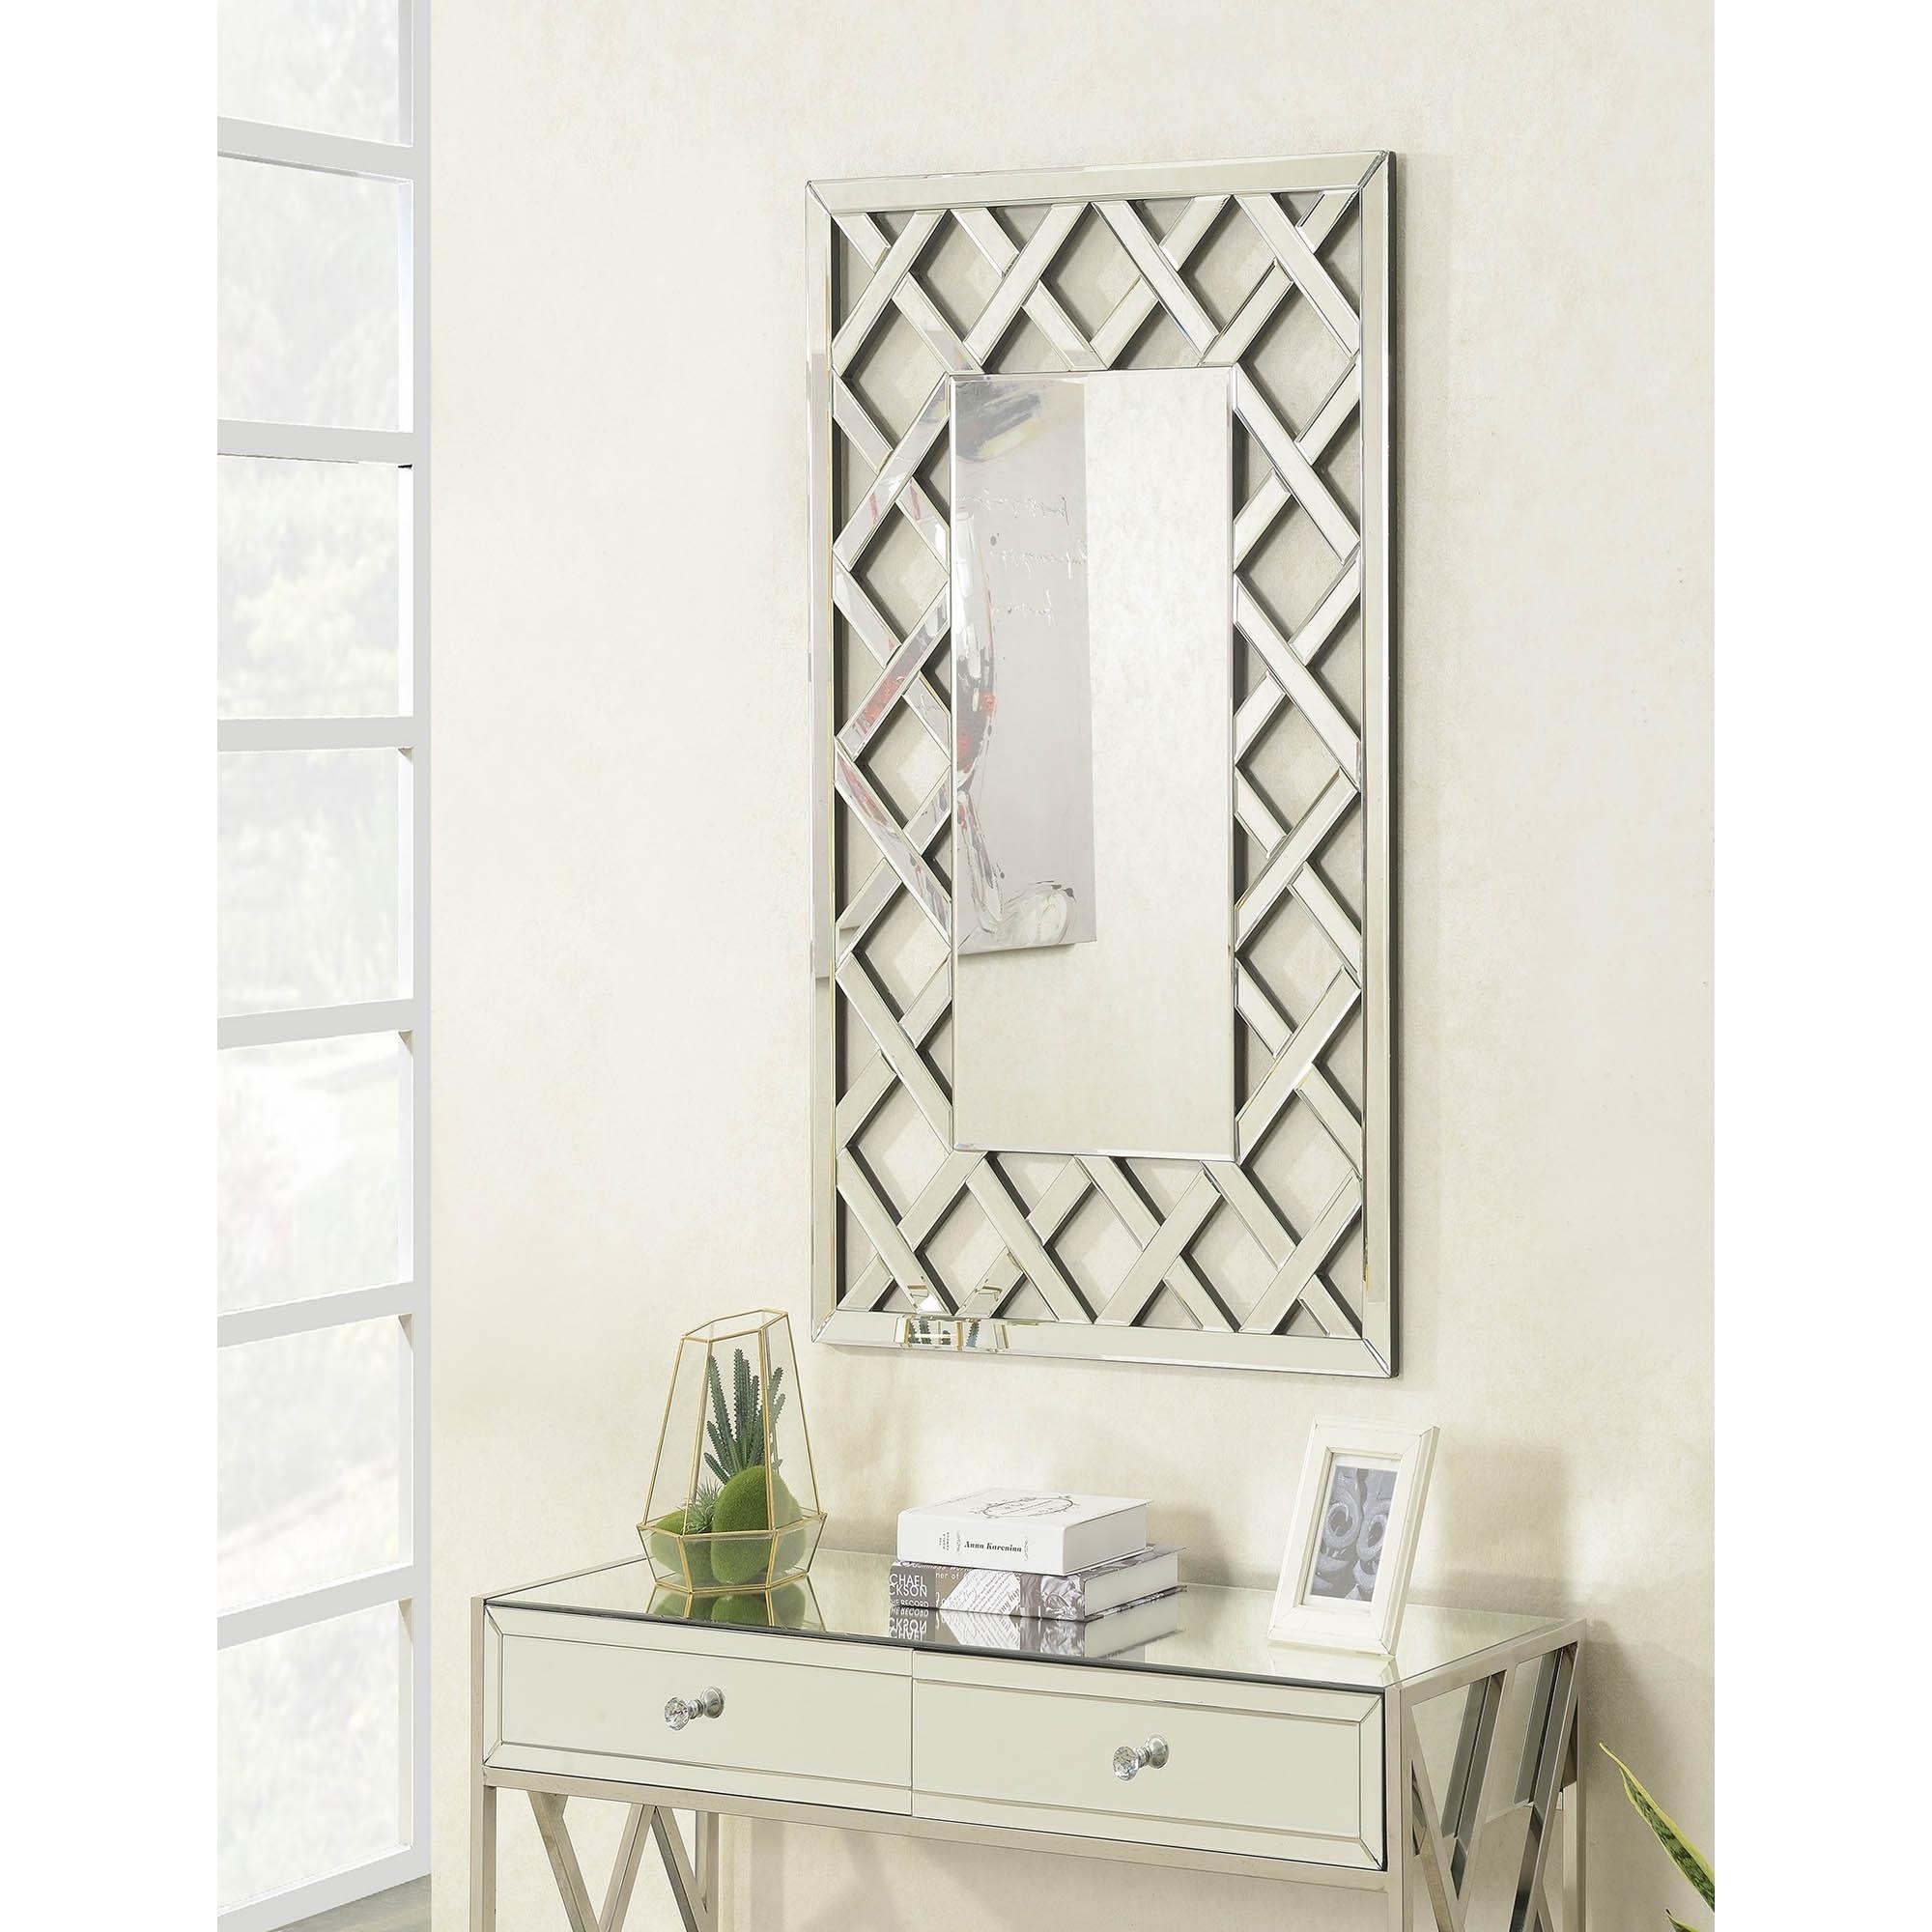 Pacific Mirrored Rectangular Wall Mirror Wall Mirror Homesdirect365